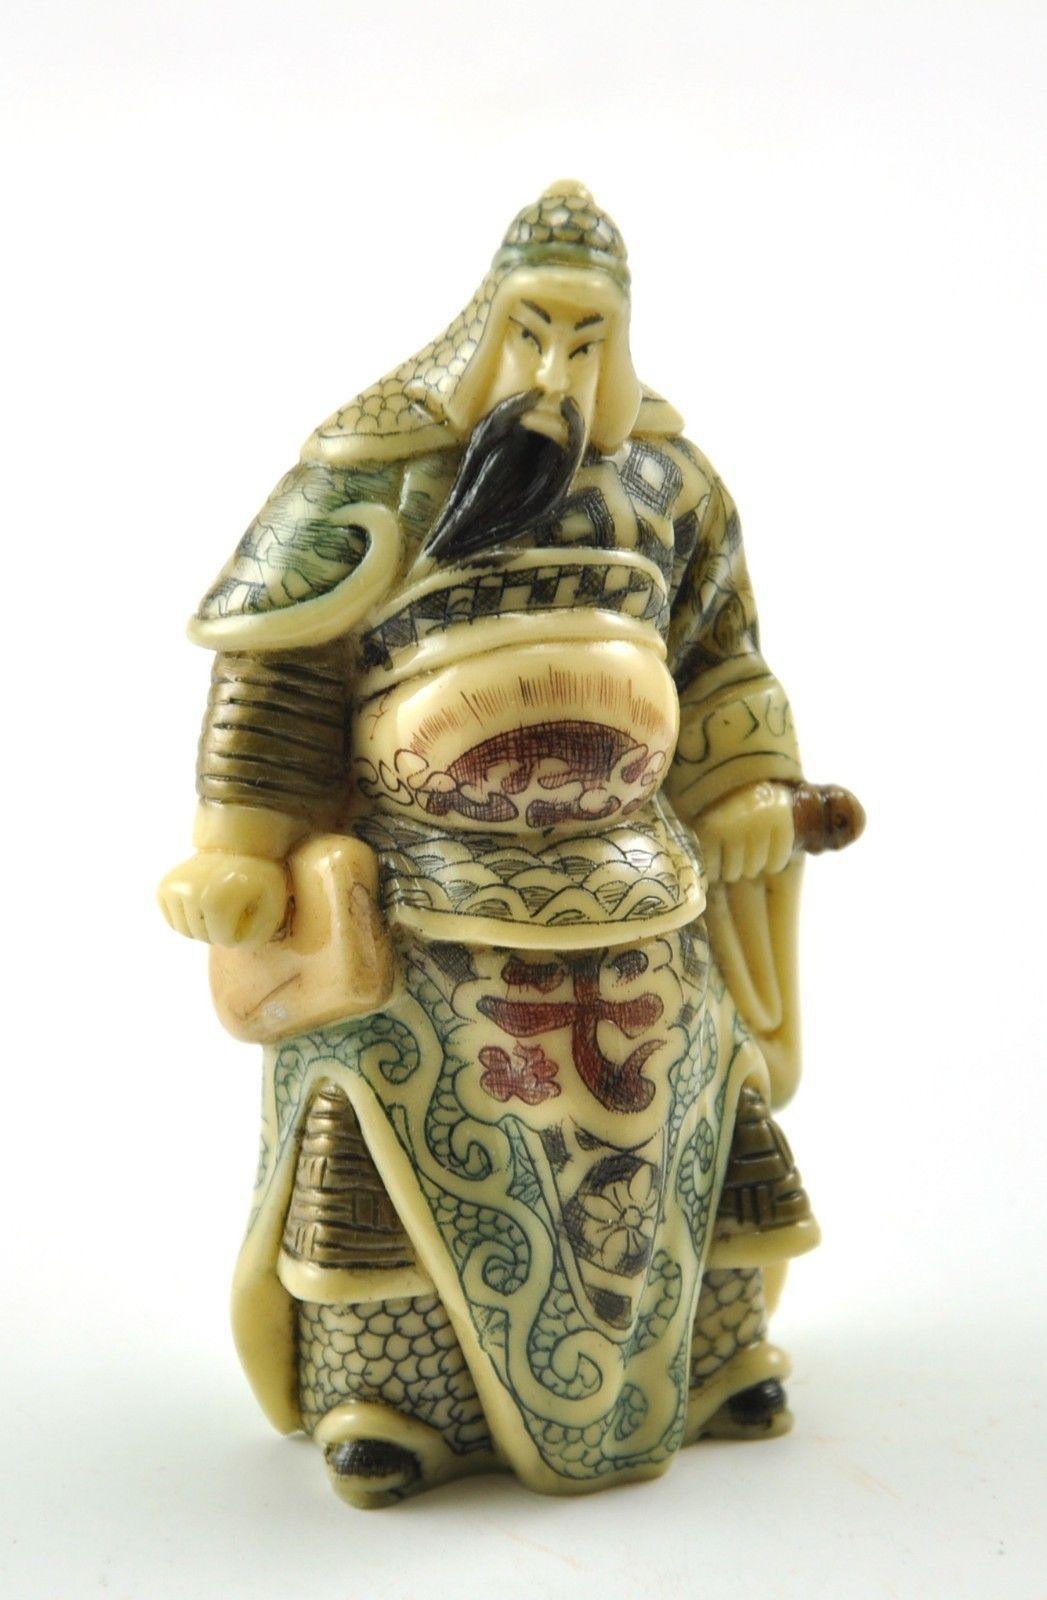 Vintage Chinese Japanese Mini Warrior Soldier Immortal Resin Hand carve Figurine   eBay